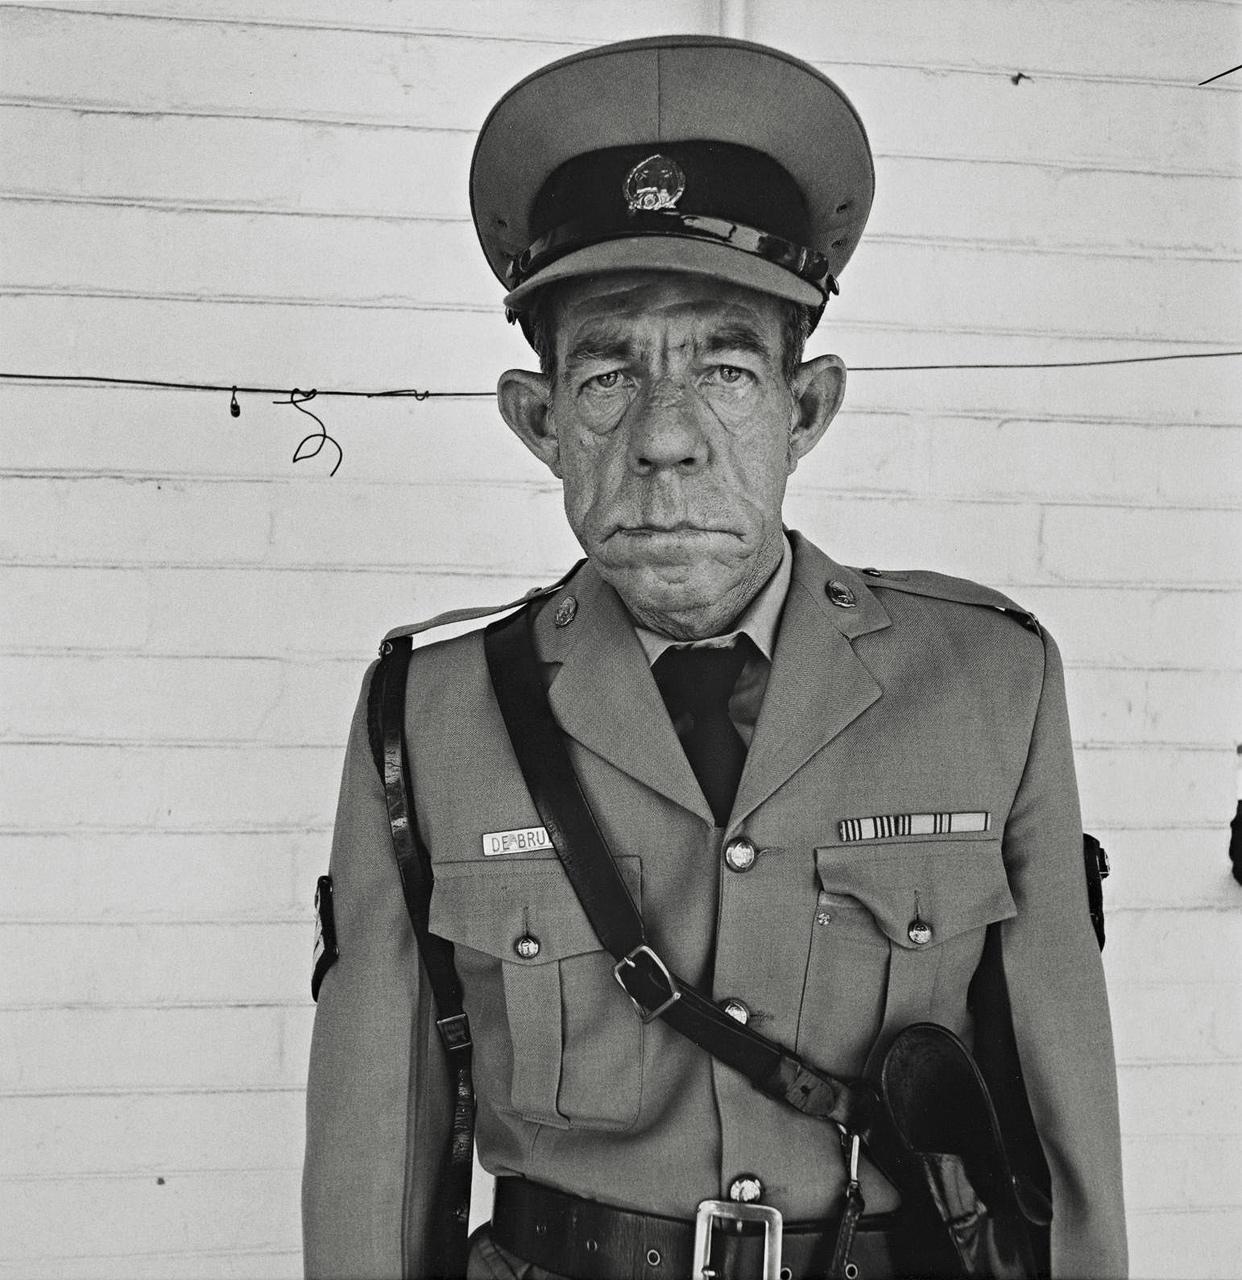 sergeant-f-de-bruin-department-of-prisons-by-roger-ballen-1992